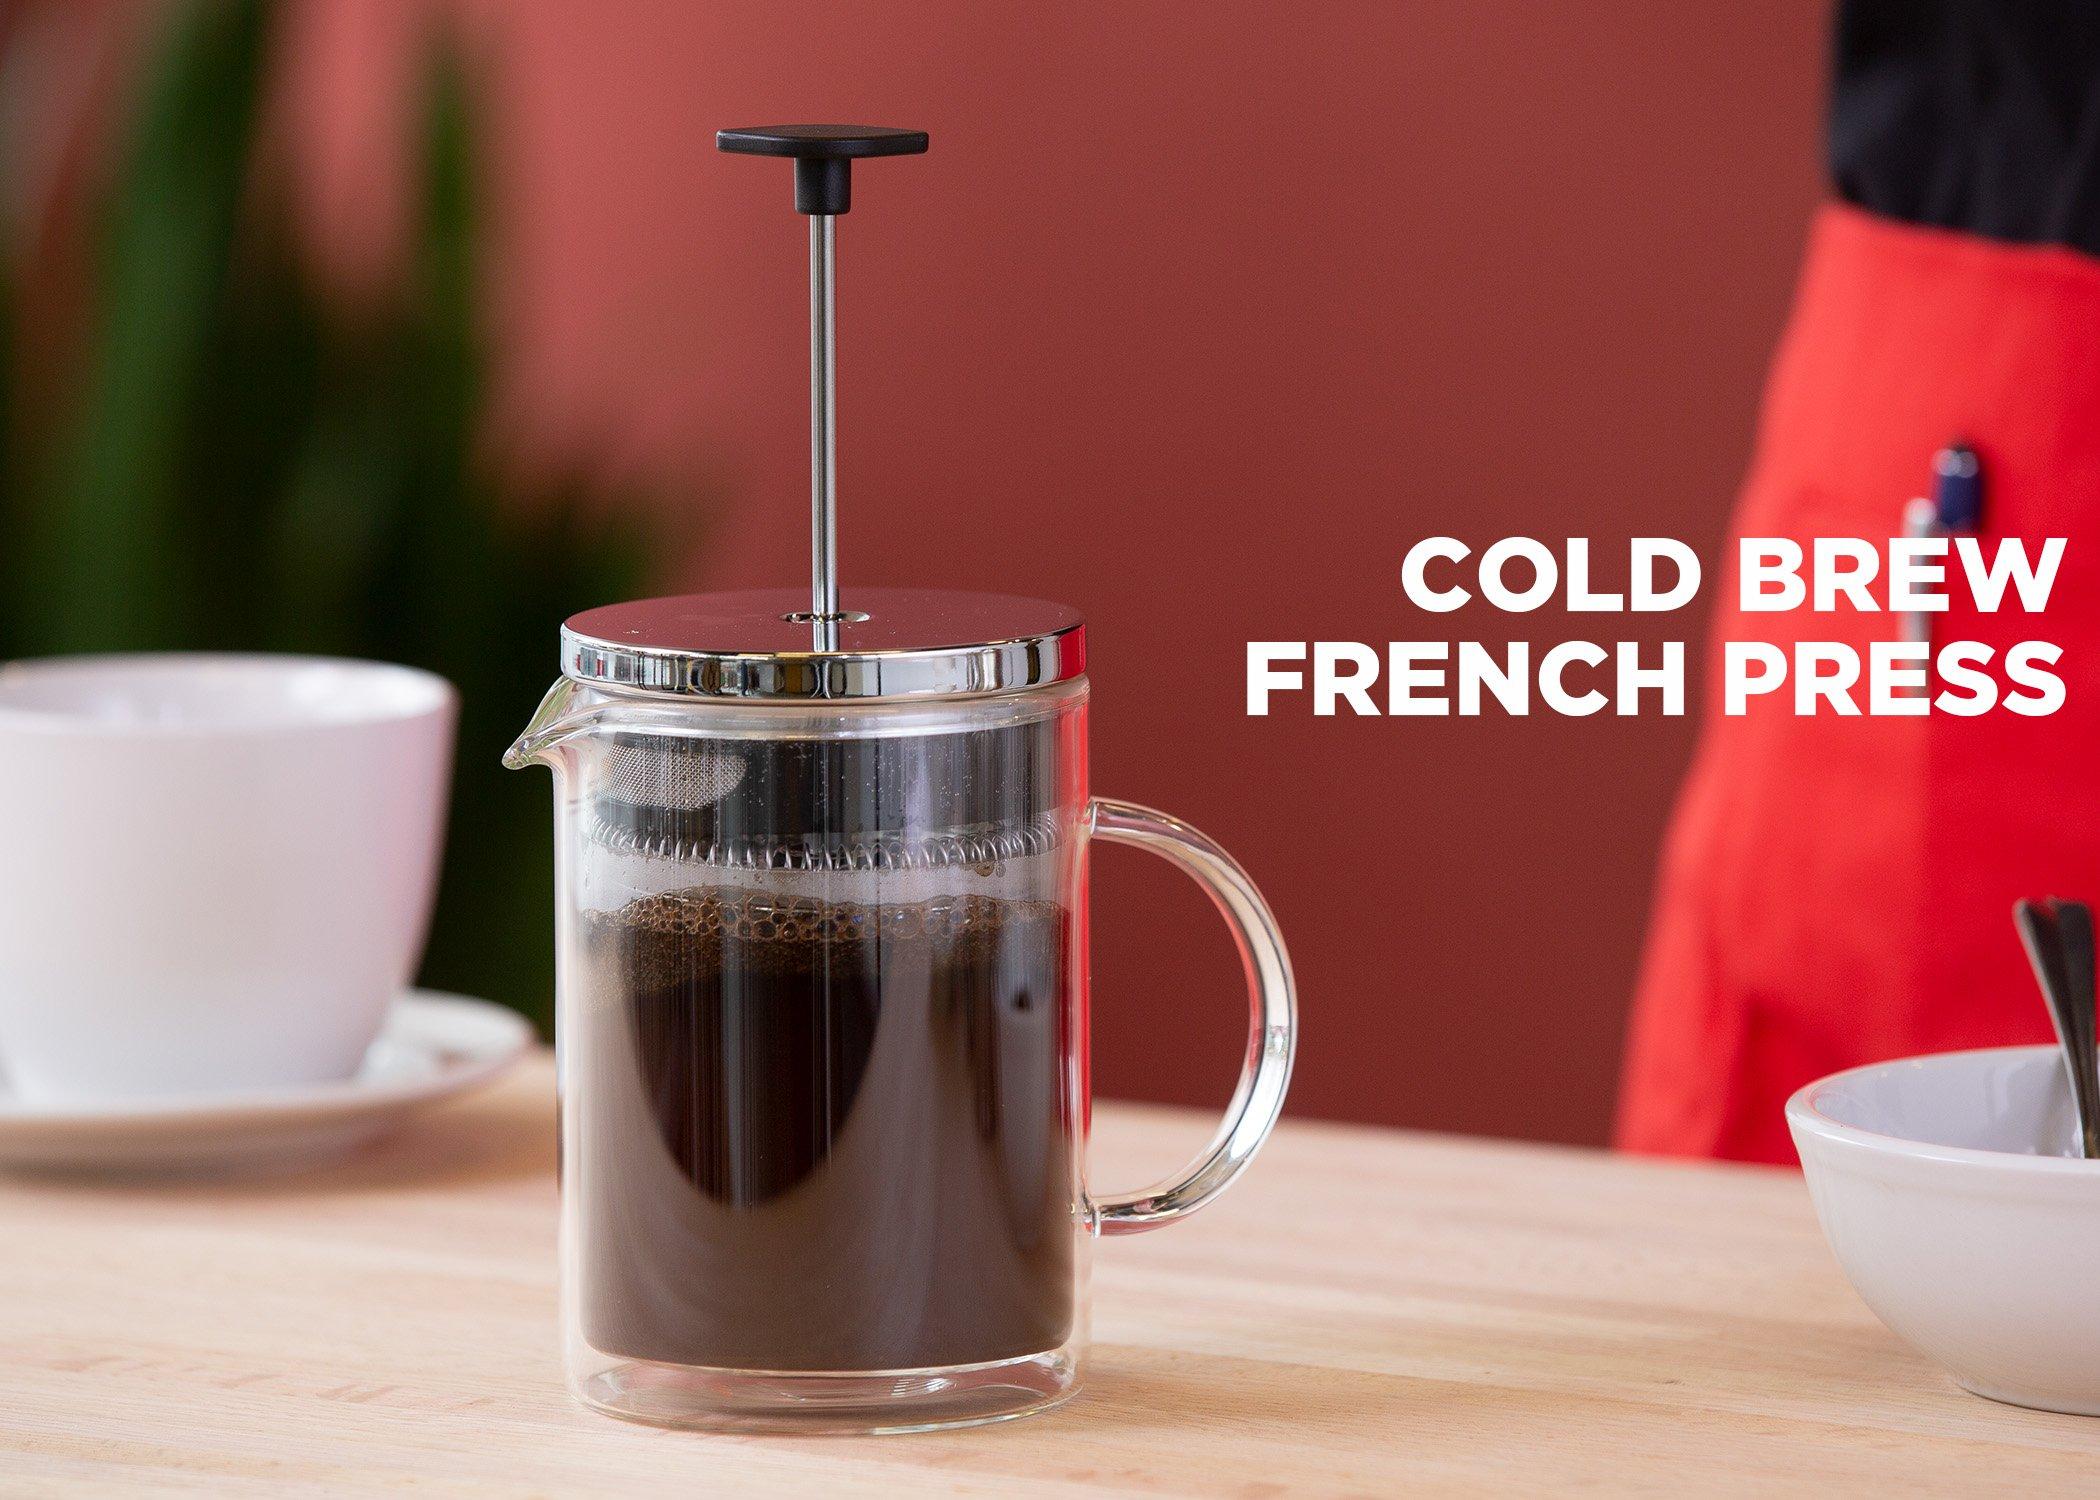 coldbrewfrenchpress